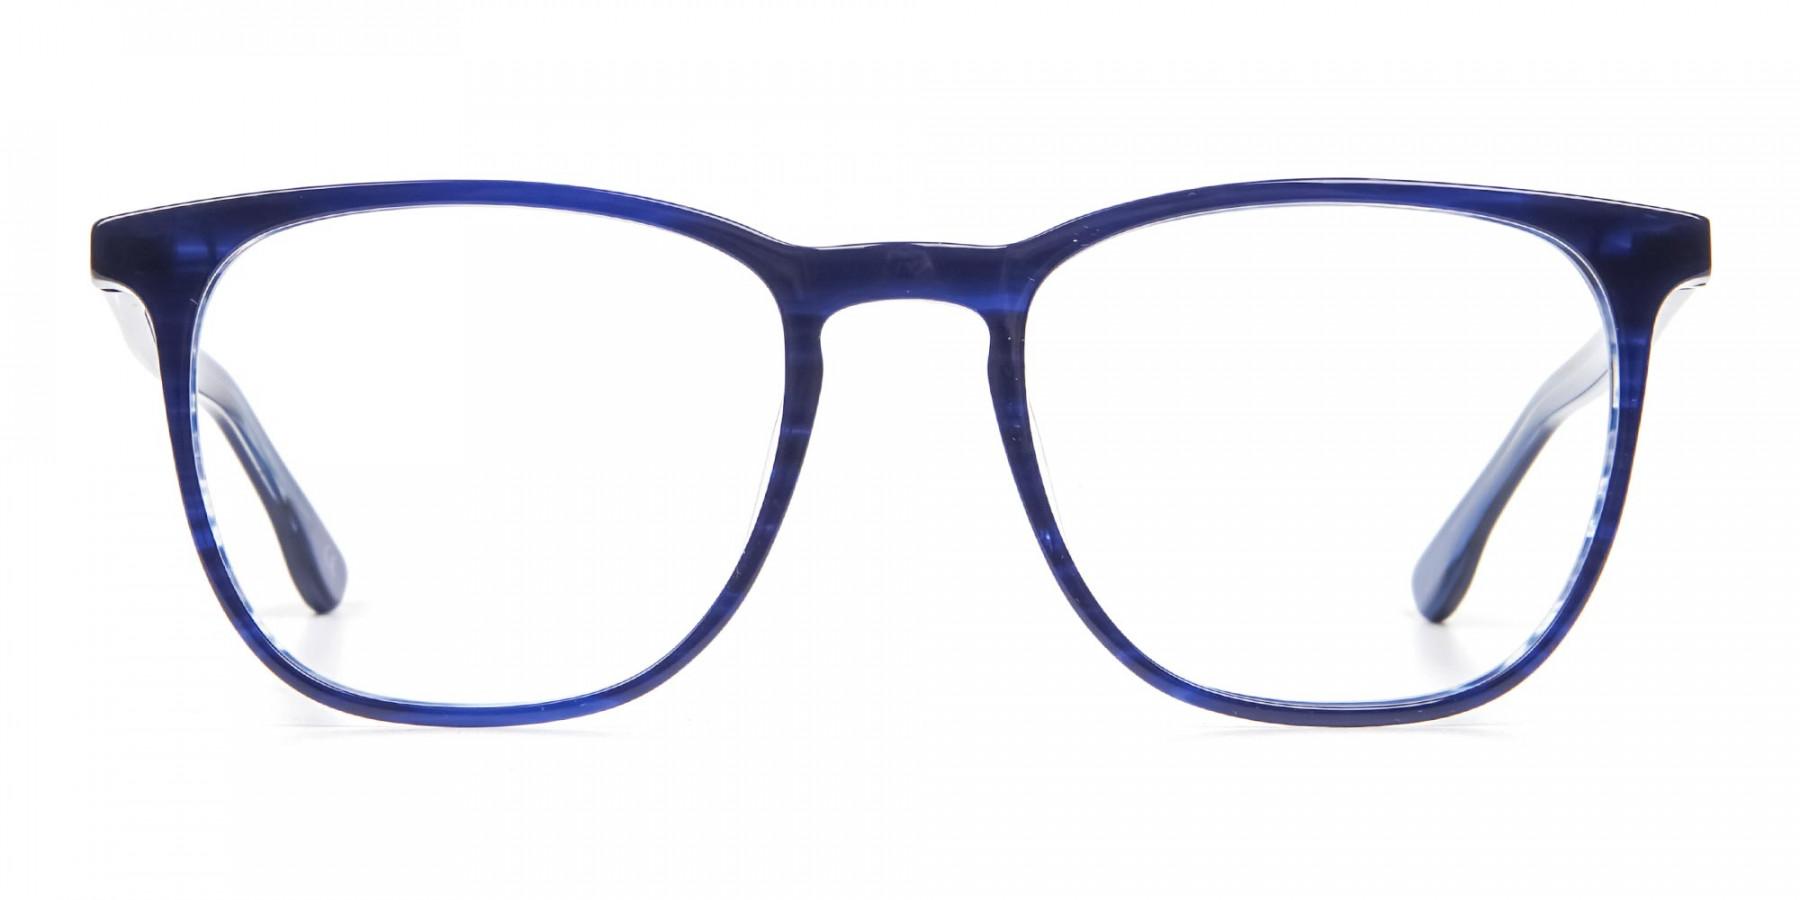 Noble Blue Frame in Square - 1